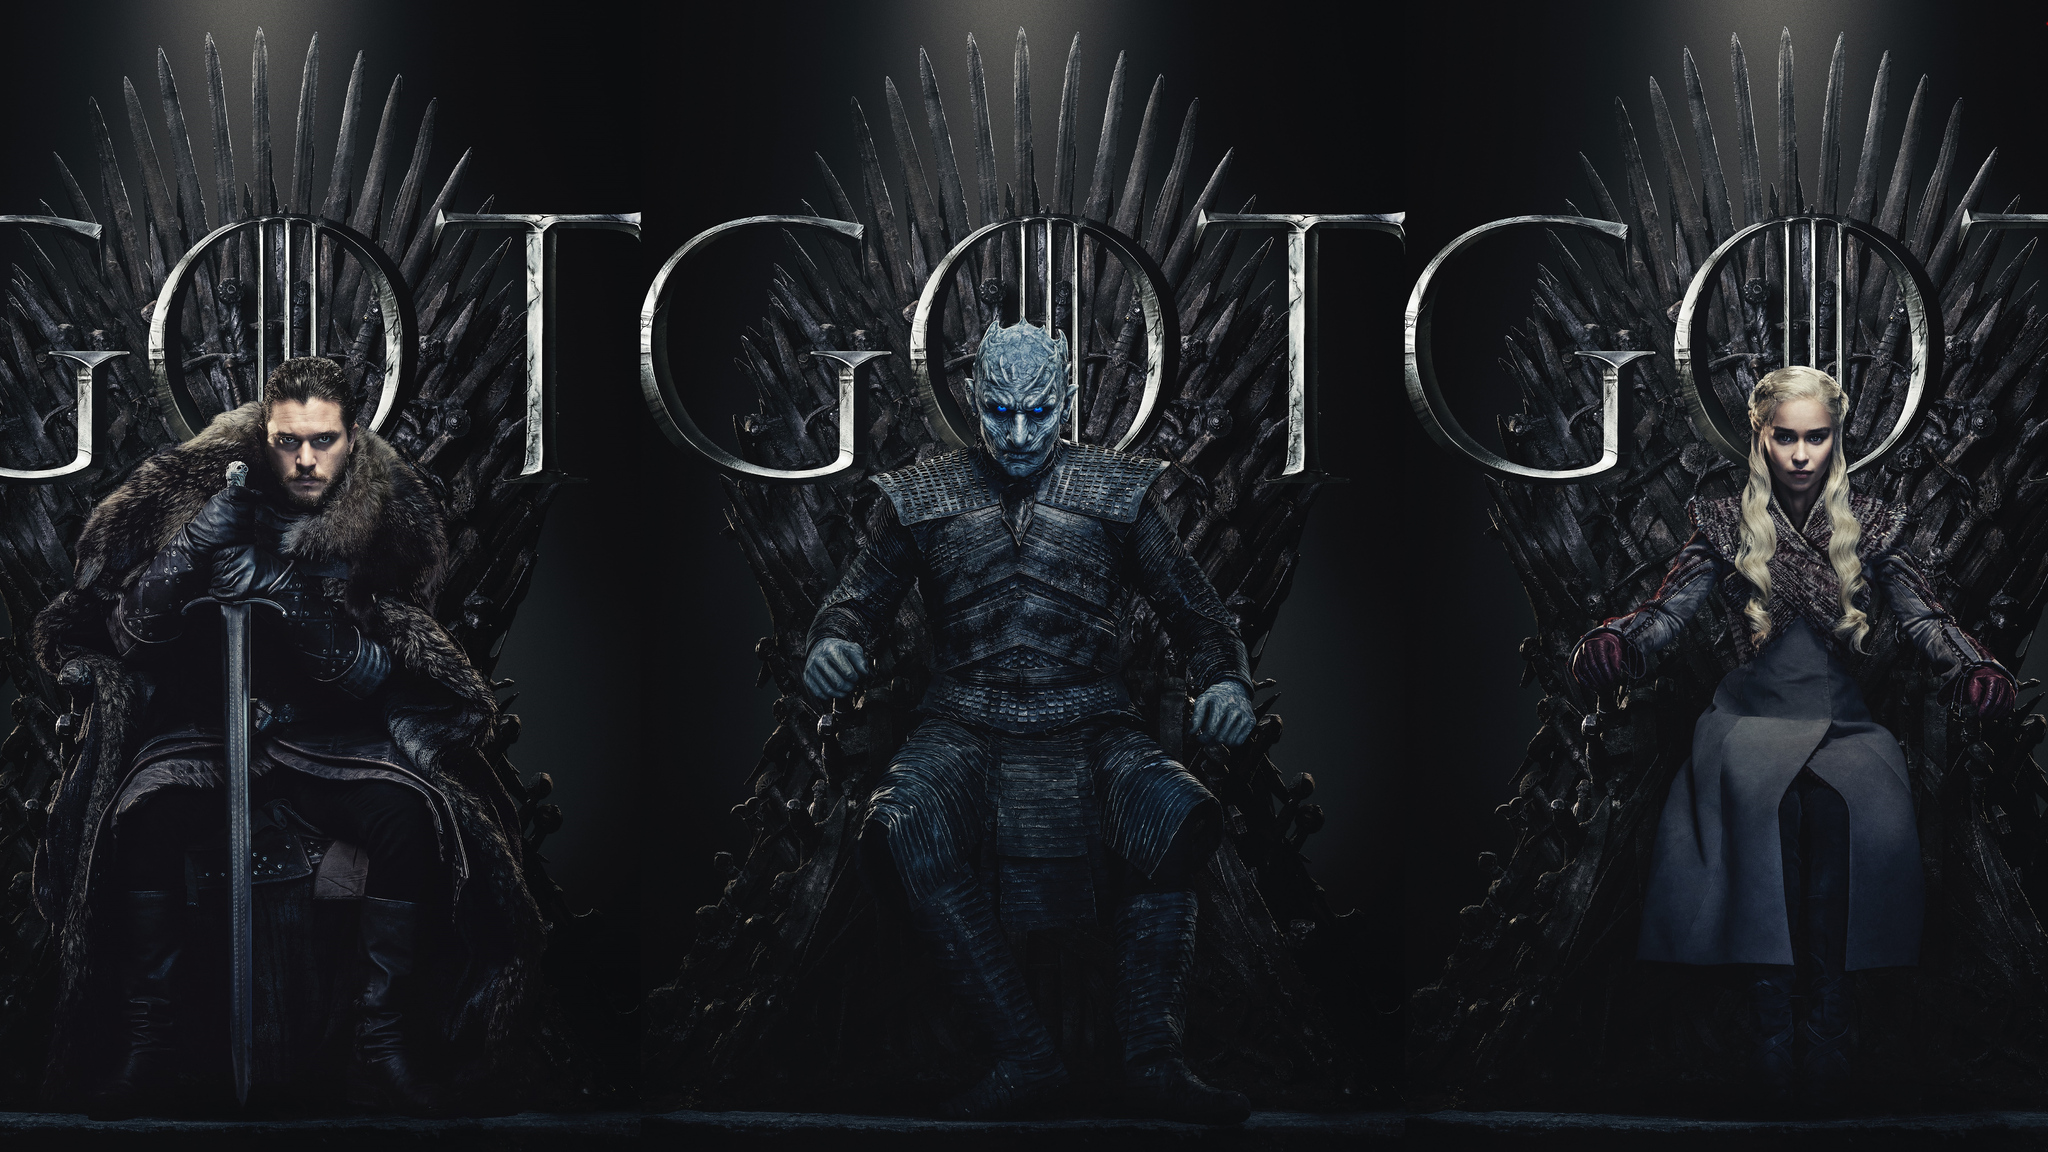 game-of-thrones-season-8-poster-2019-0i.jpg